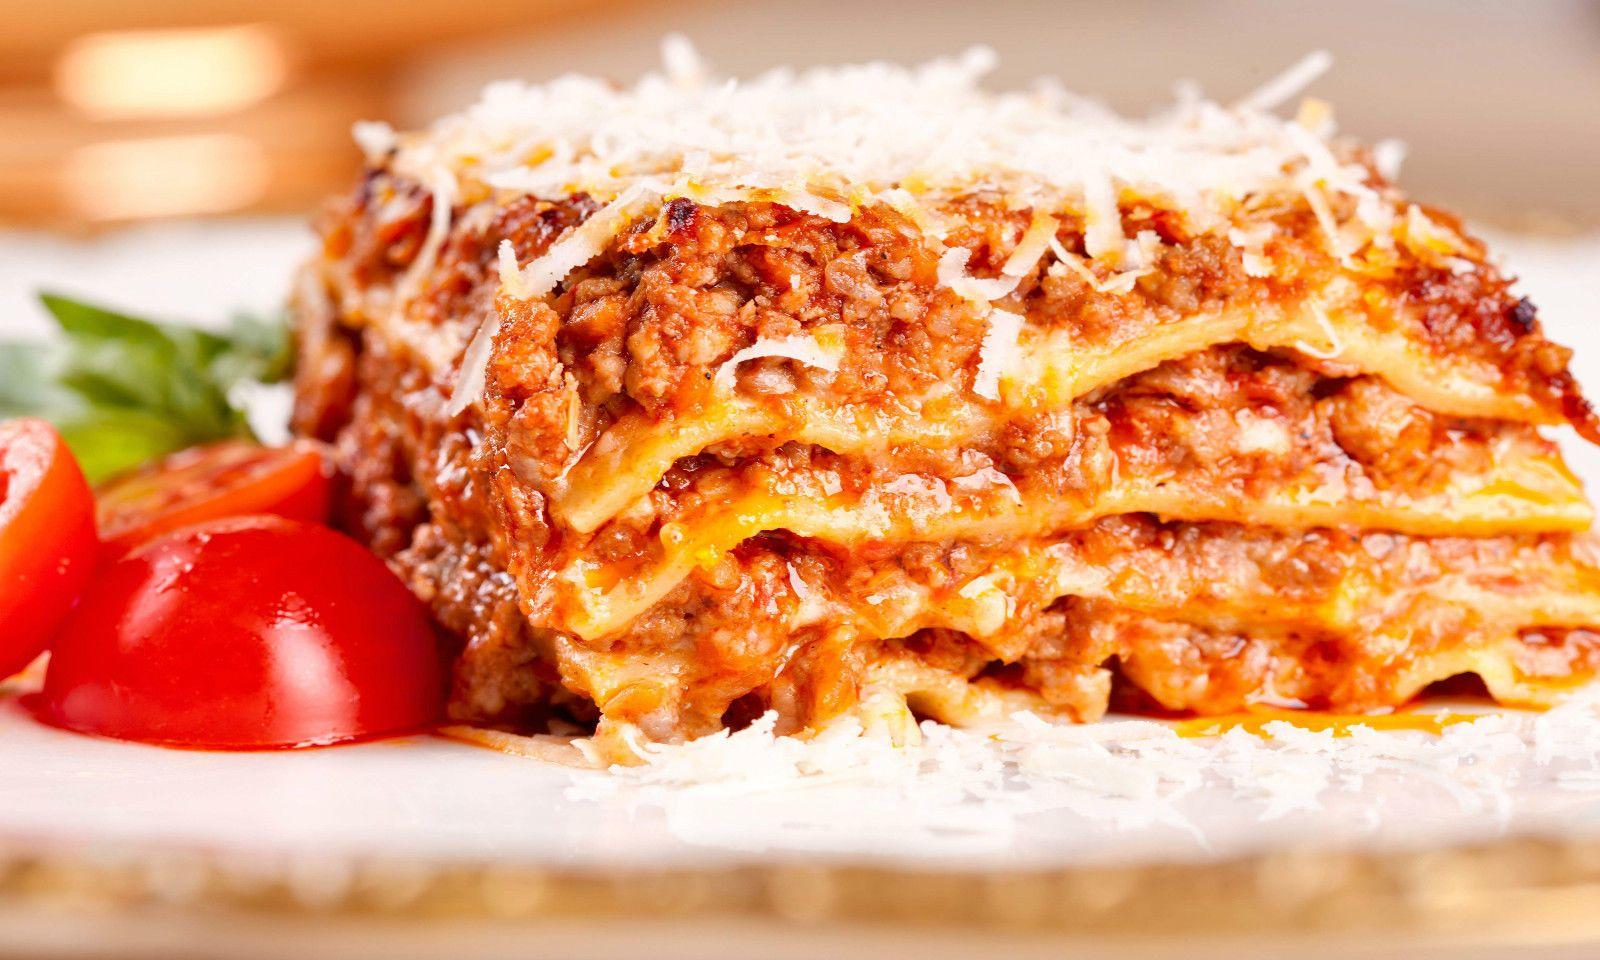 Authentic italian food delicious original italian lasagna recipe authentic italian food delicious original italian lasagna recipe pdf free shipping forumfinder Gallery